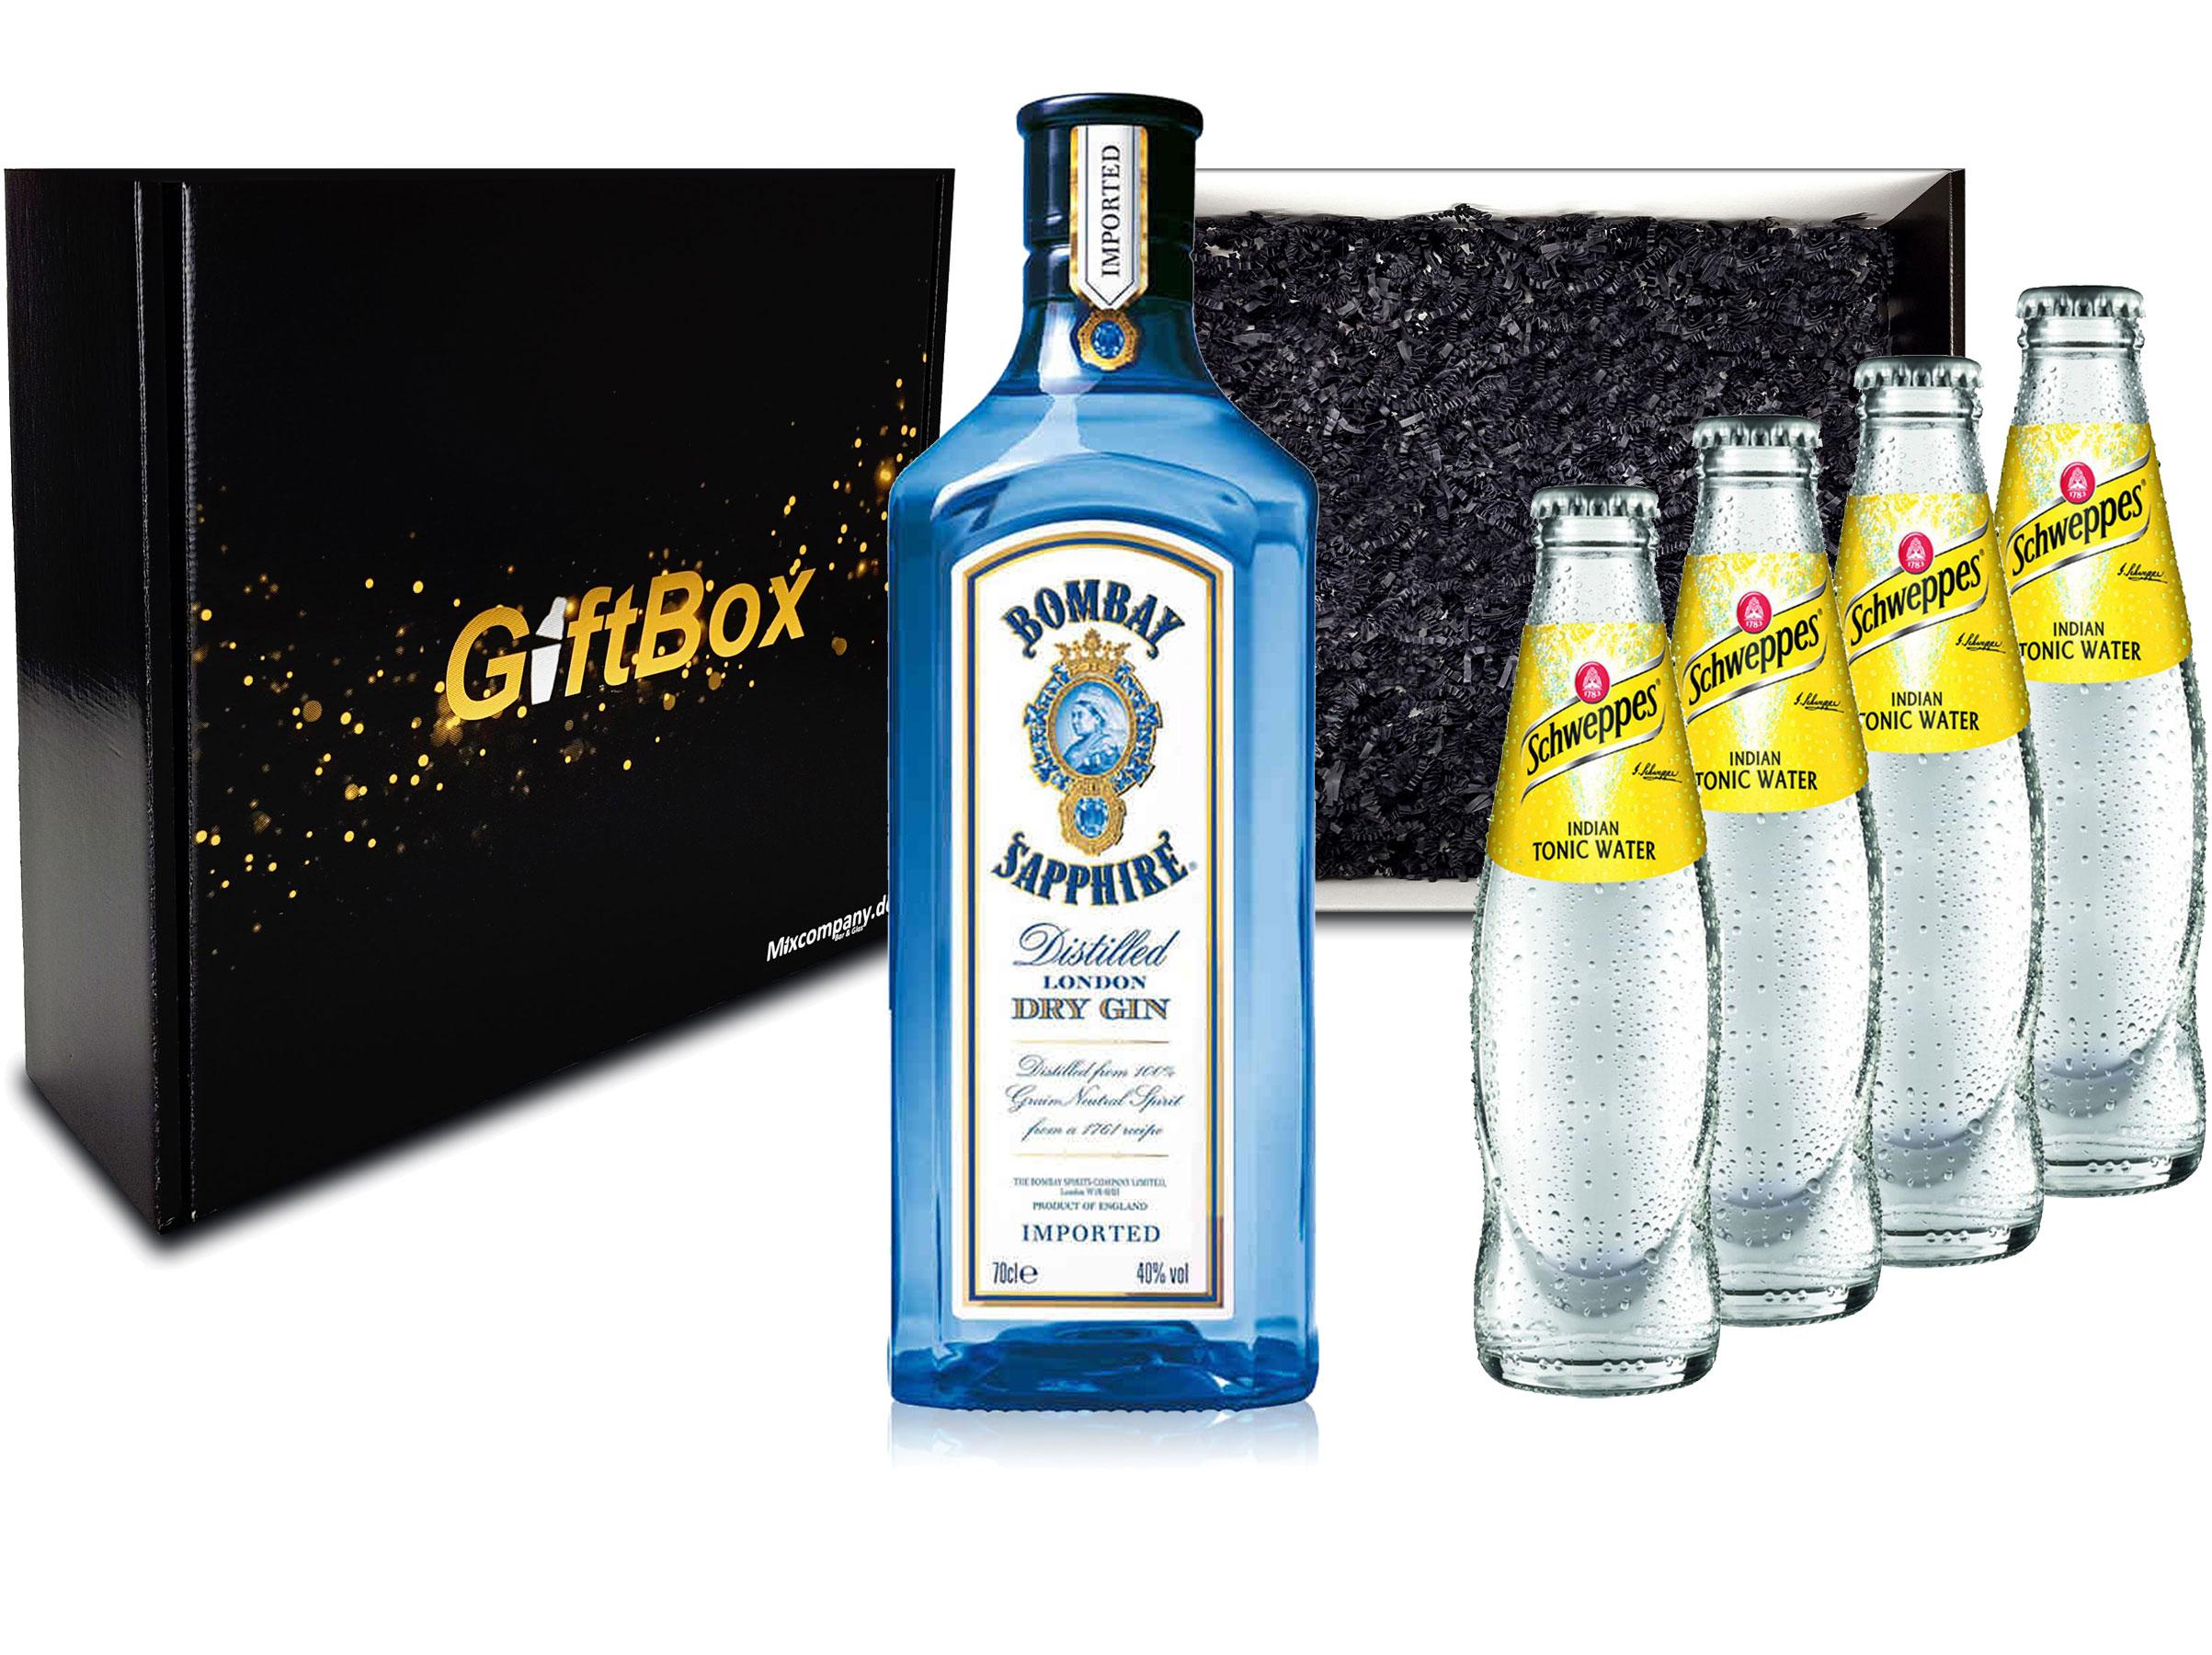 Gin Tonic Giftbox Geschenkset - Bombay Sapphire 0,7l 700ml (40% Vol) + 4x Schweppes Tonic Water 200ml inkl. Pfand MEHRWEG + Geschenkverpackung